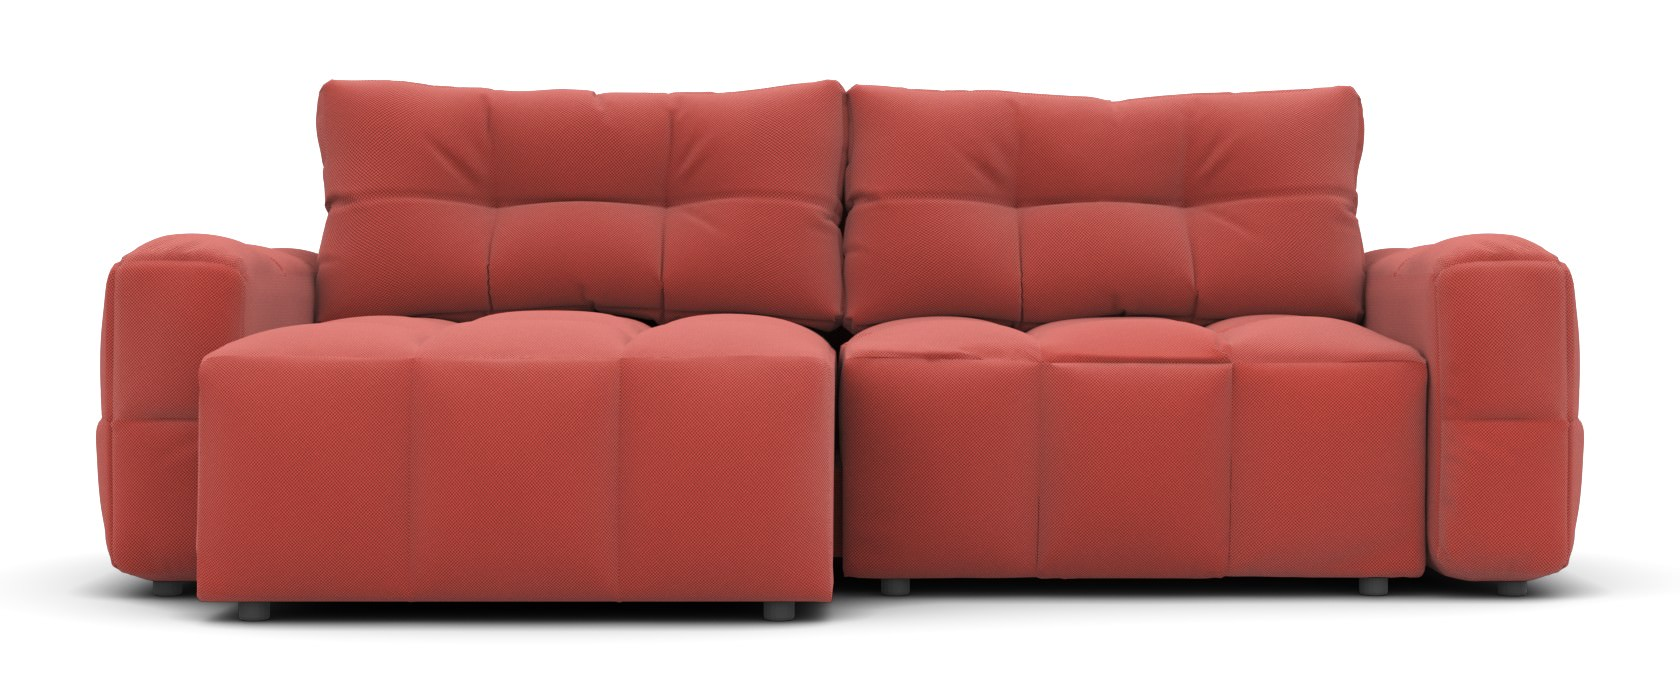 Кутовий диван Leonardo Chaise Mini - Pufetto